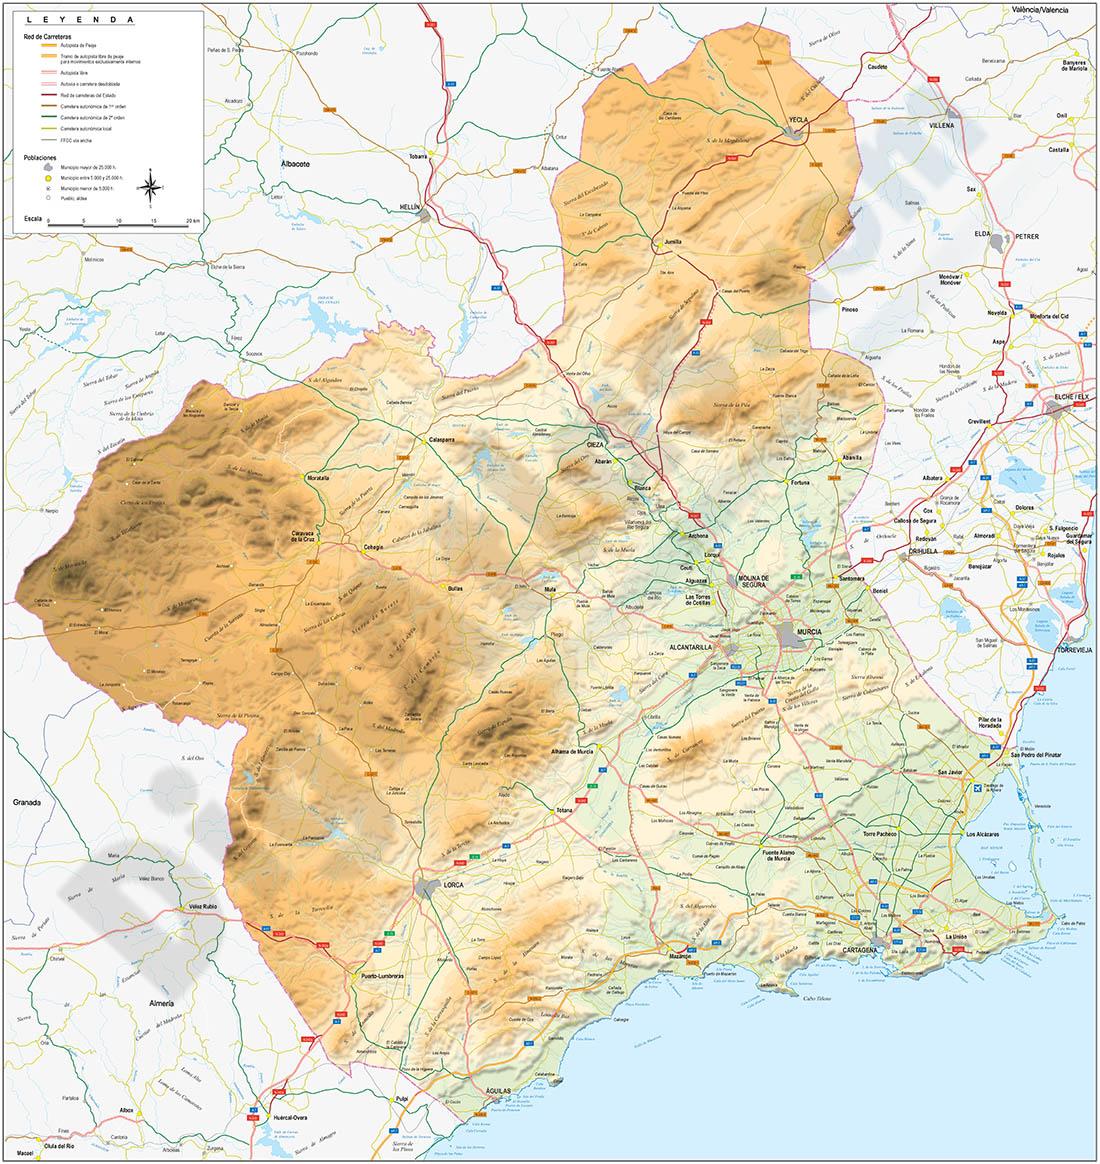 Region de Murcia map with relief image